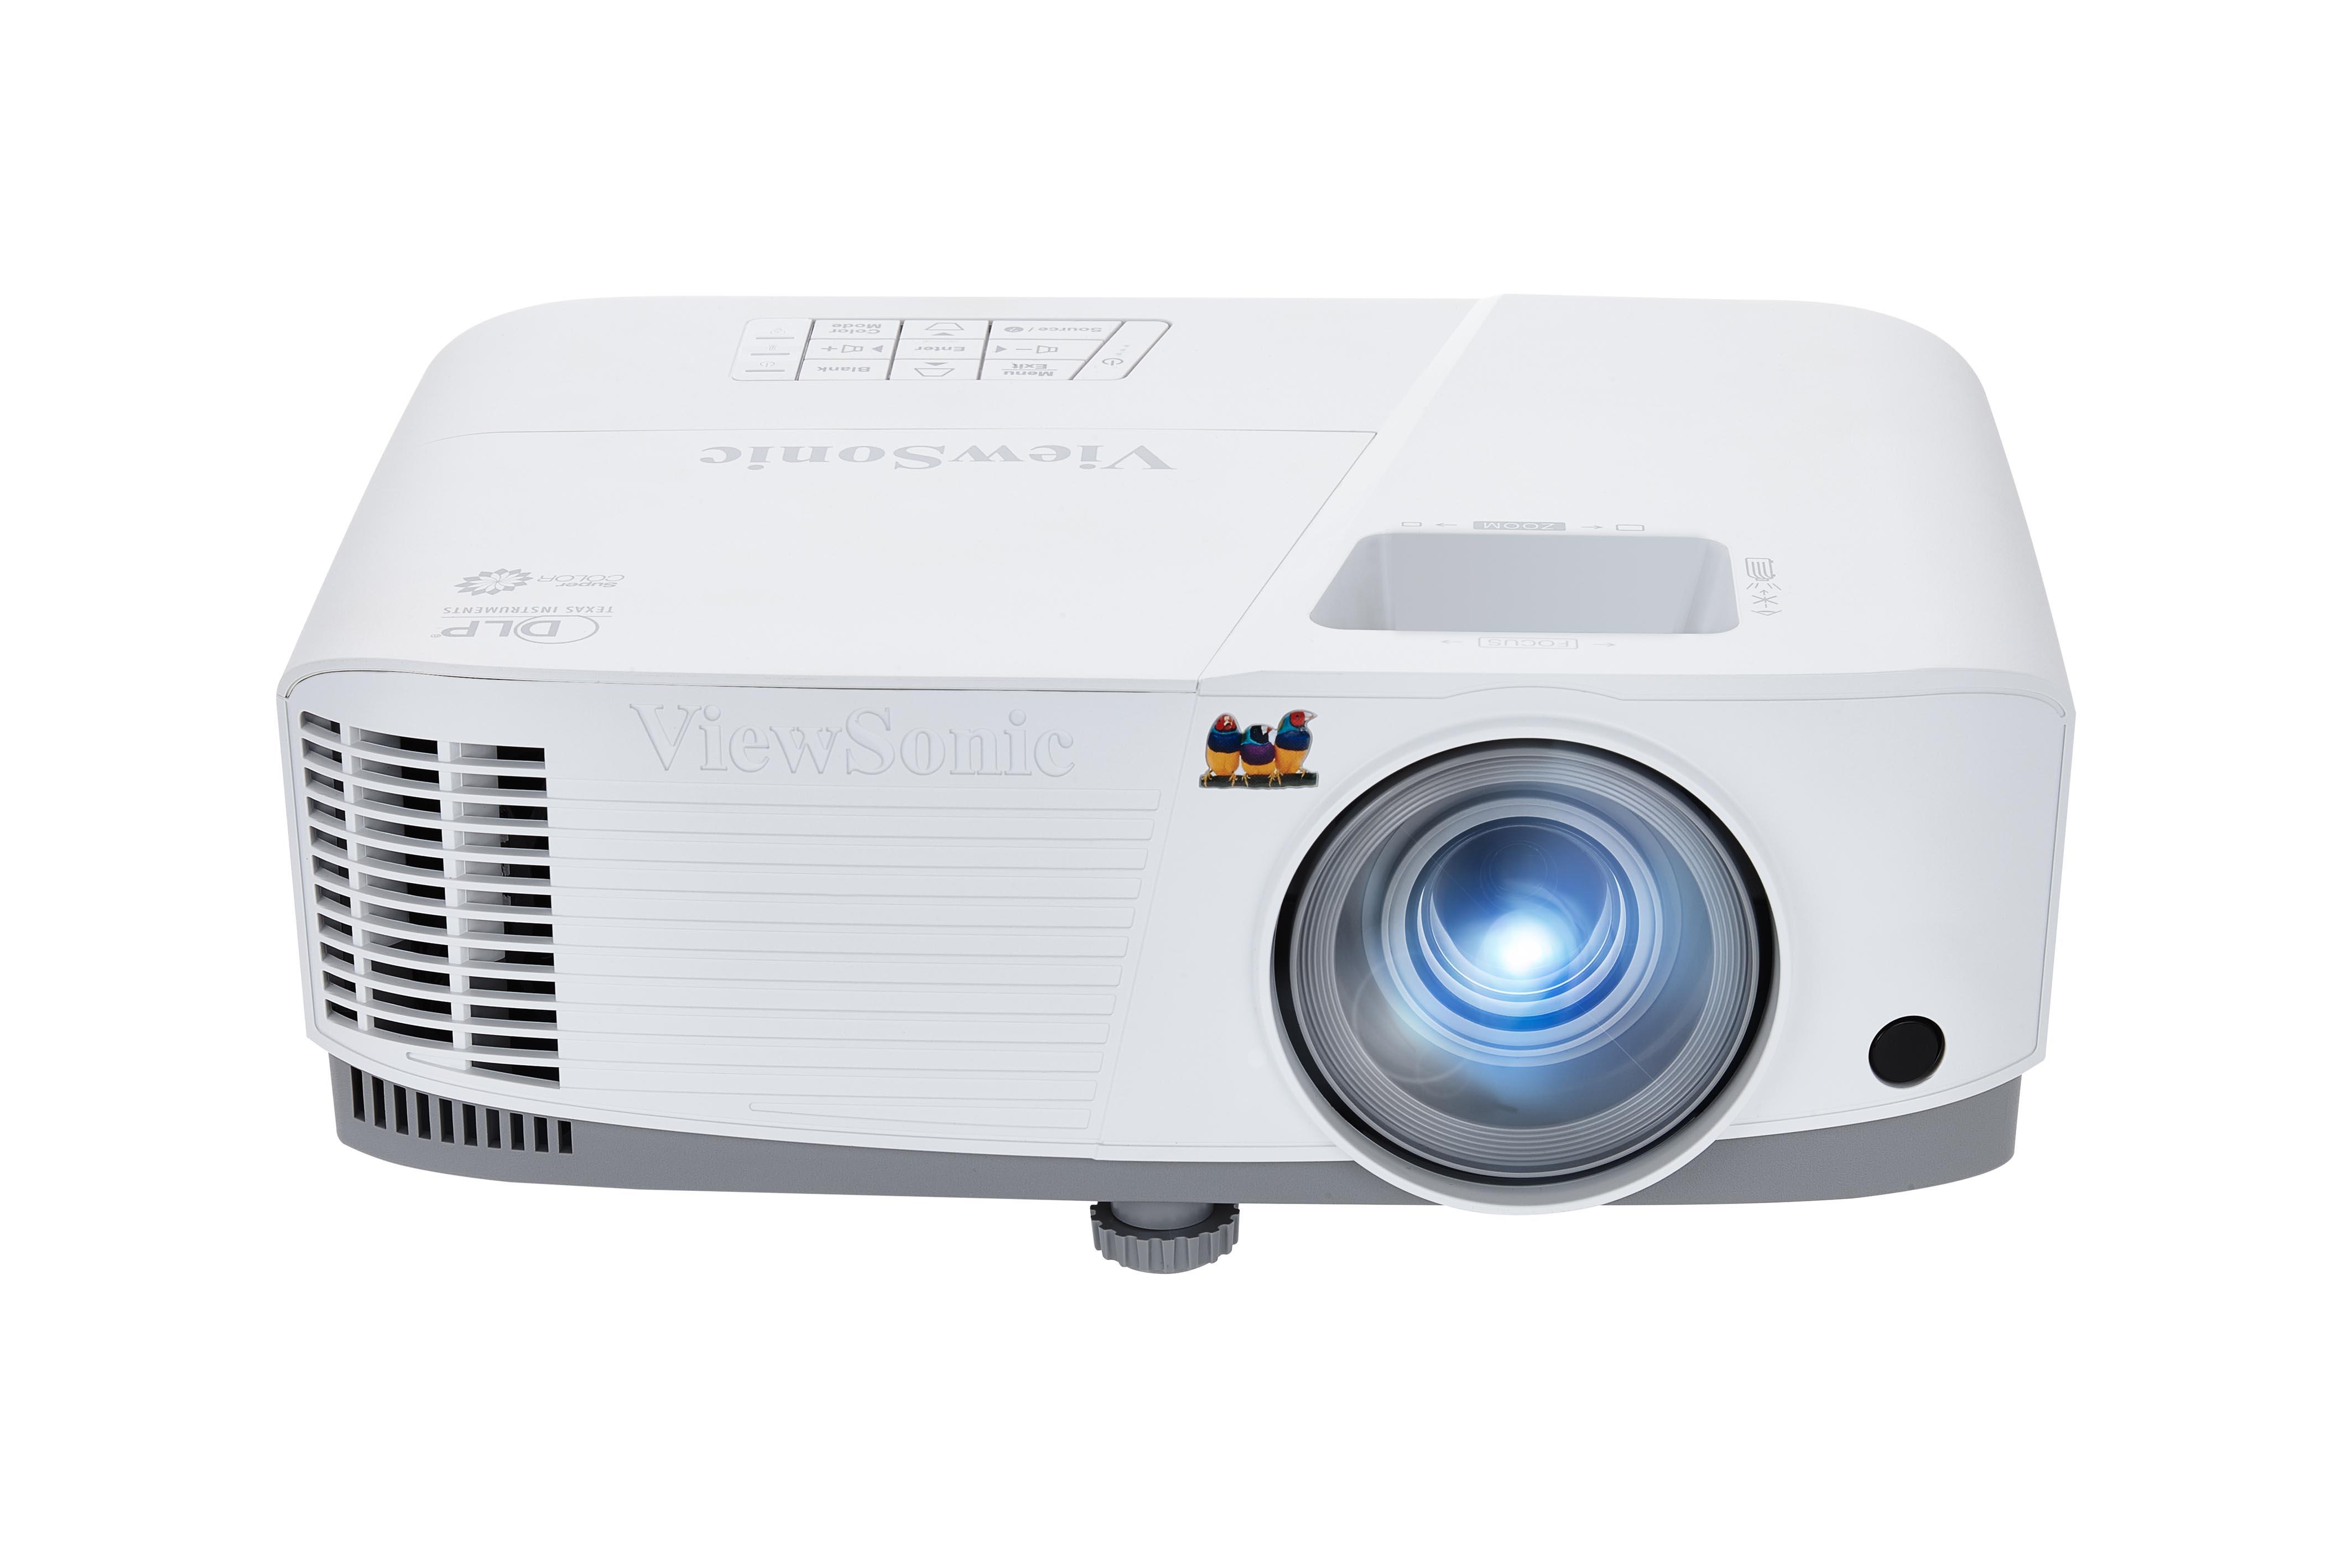 Check Out The 4 Best 1080p Projectors Under $500 2020 - Jaxtr